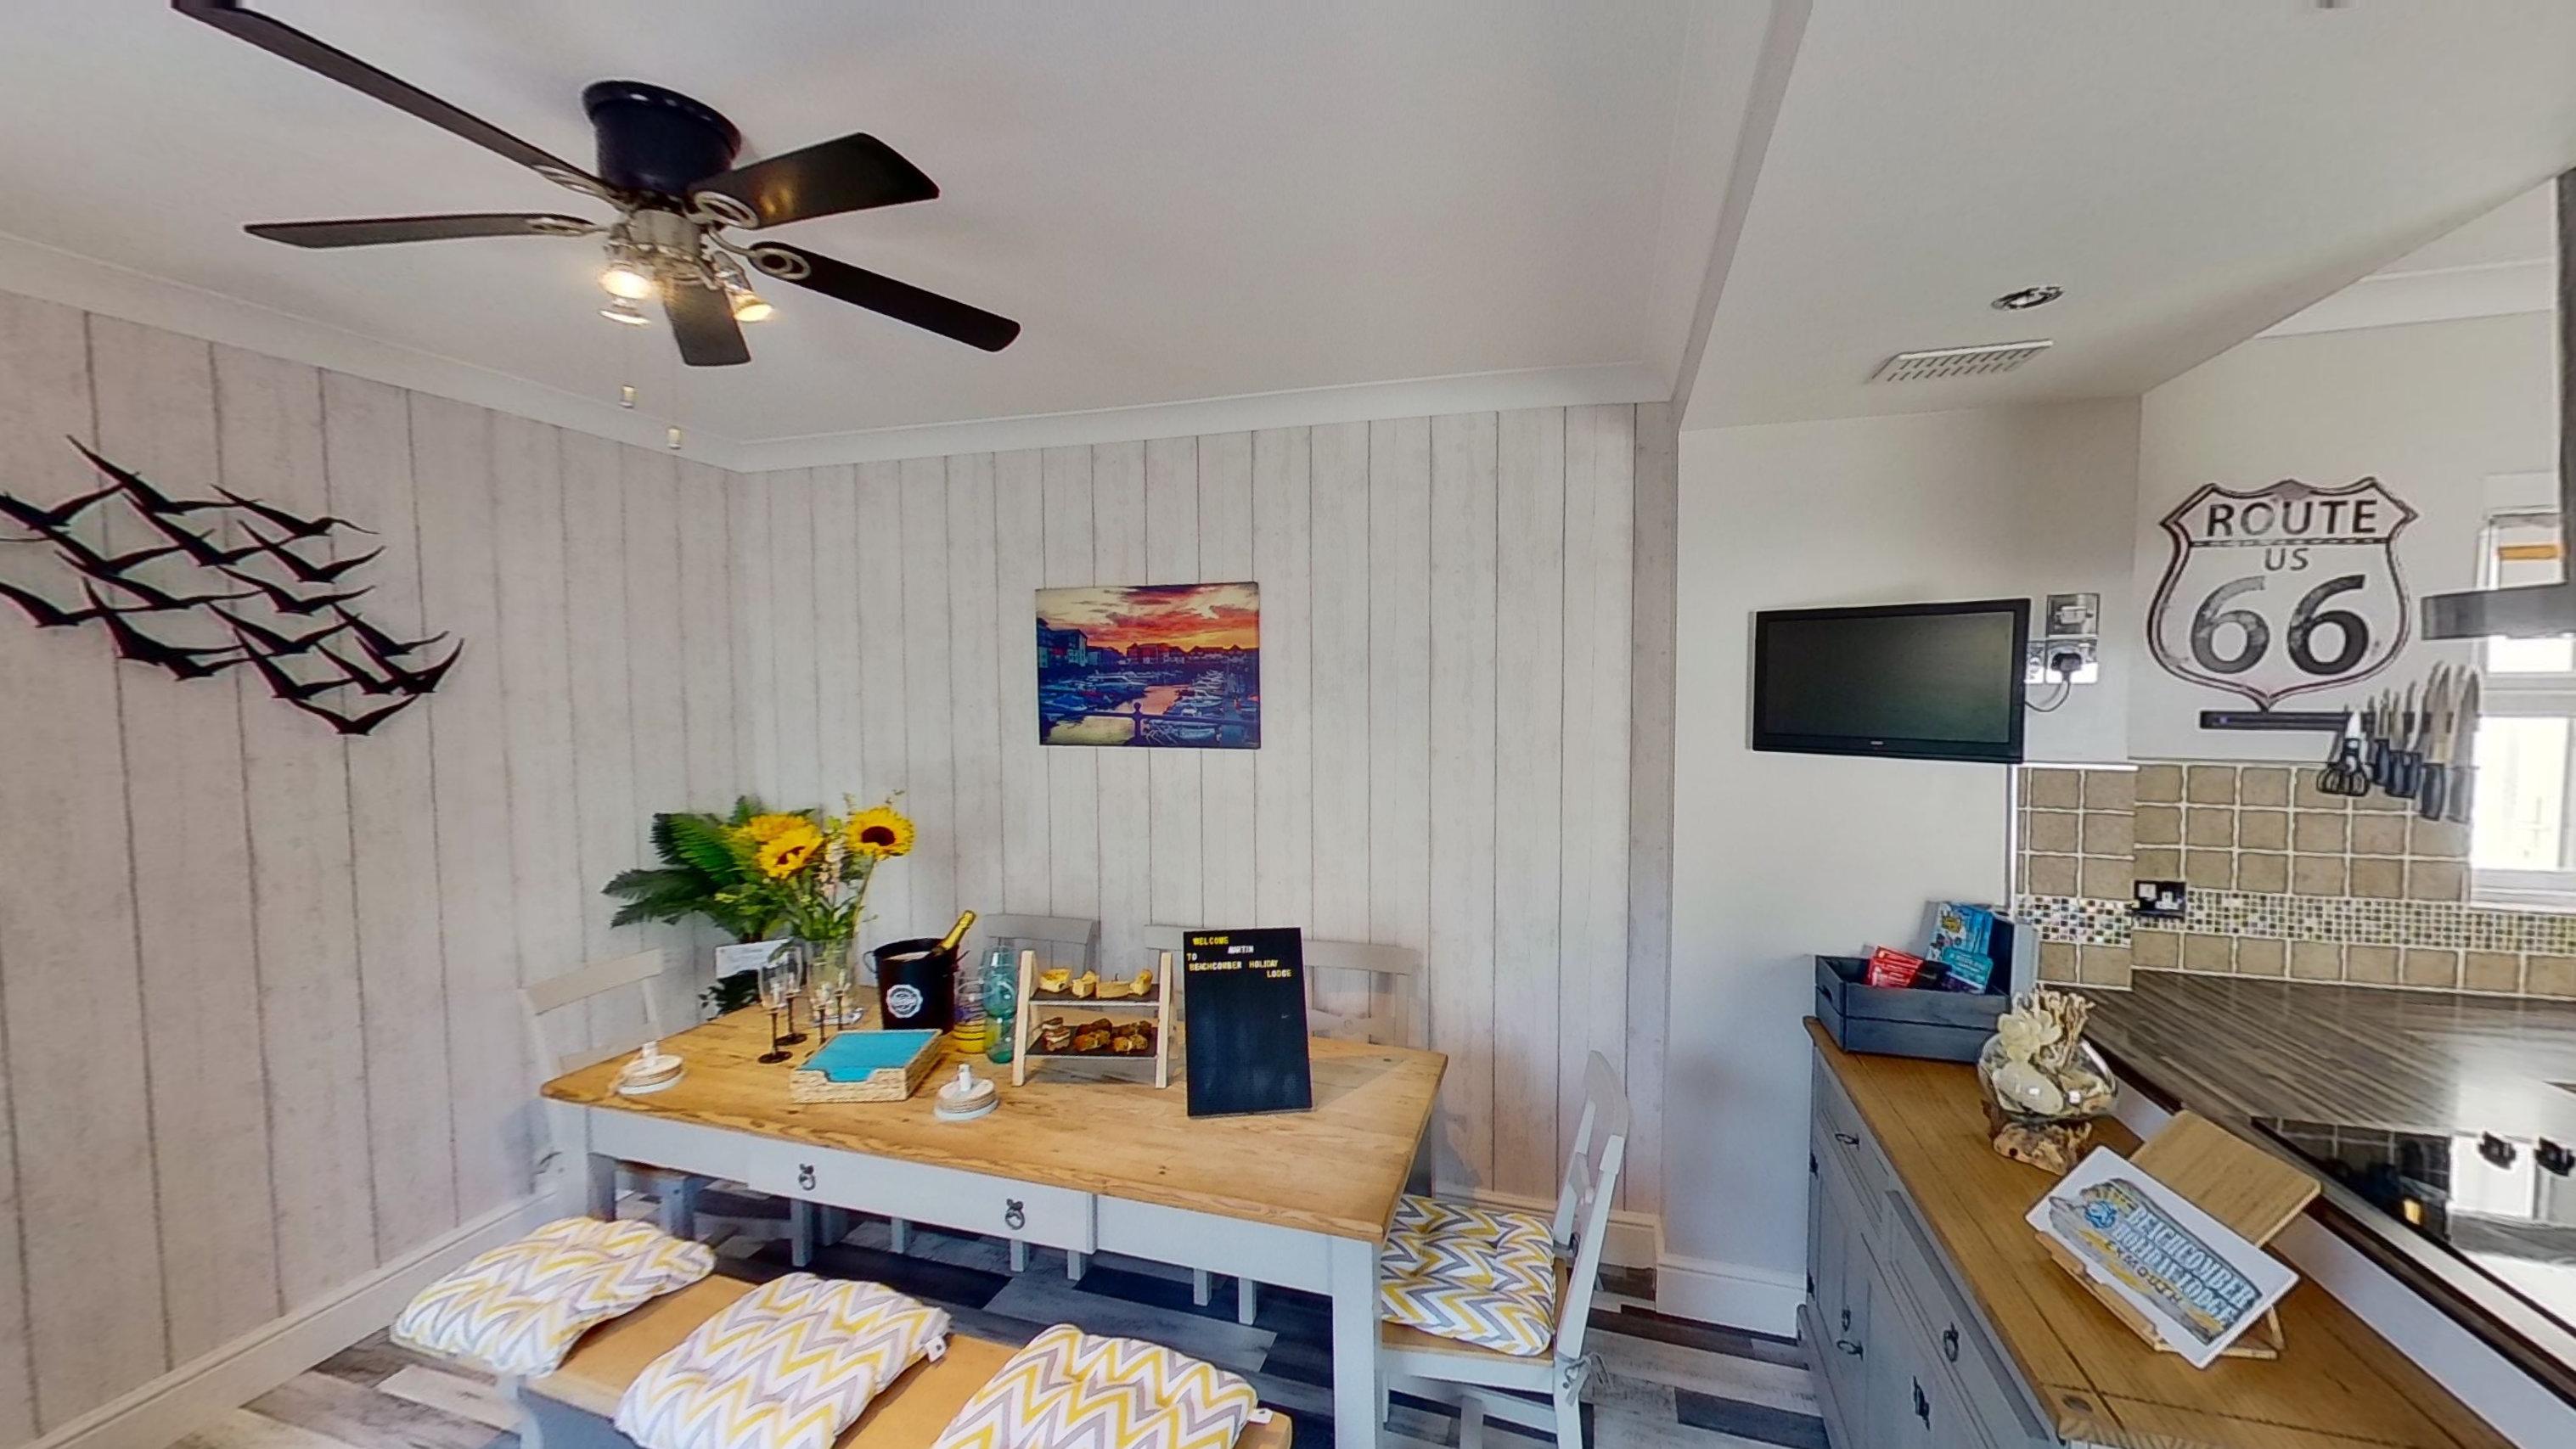 Beachcomber Holiday Lodge 07192021 051009